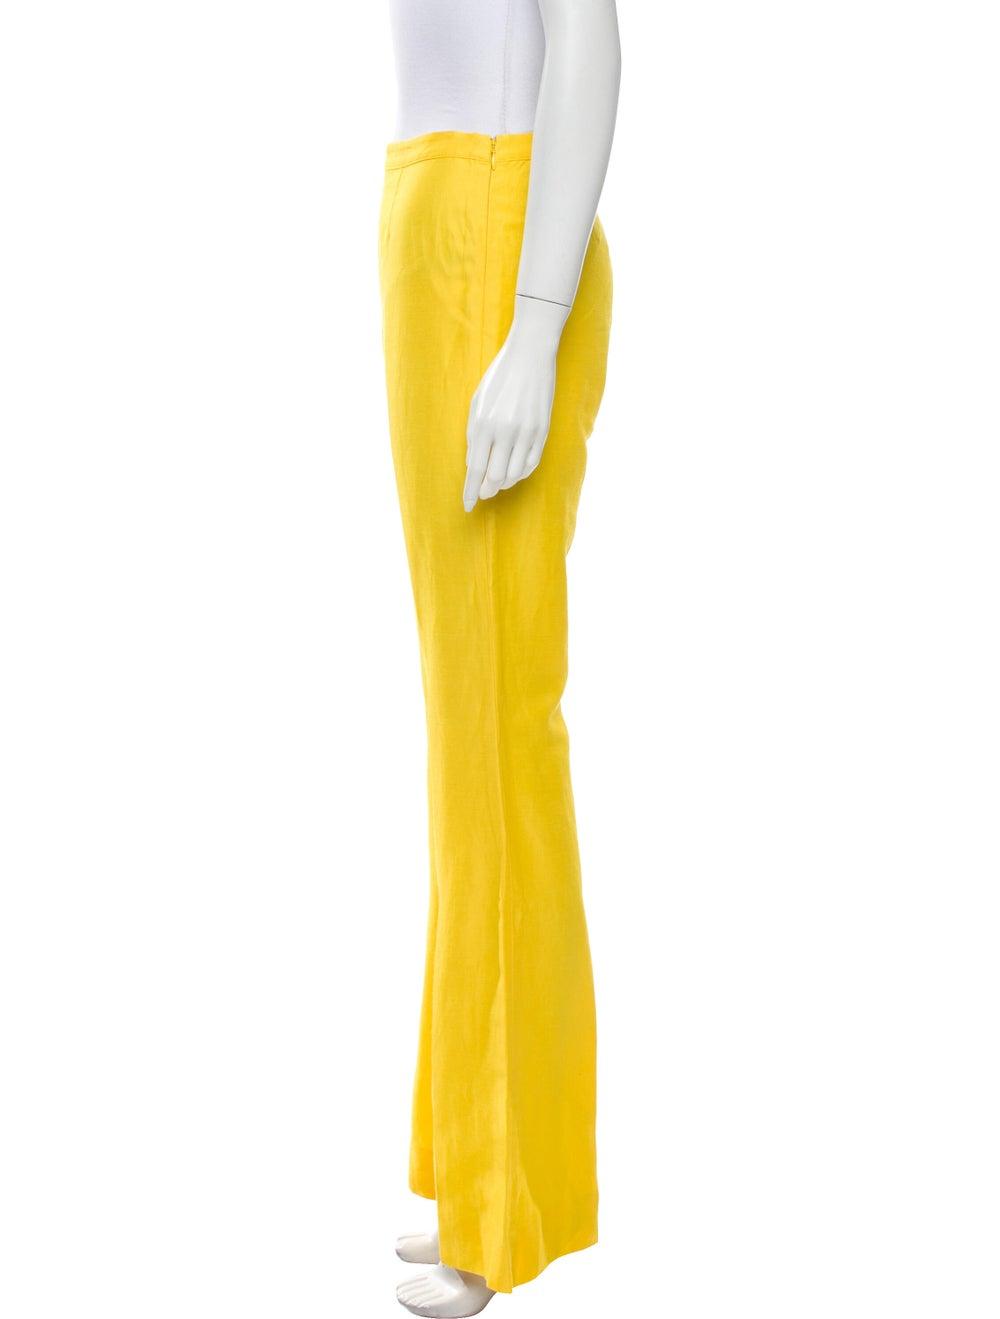 Mansur Gavriel Flared Pants Yellow - image 2